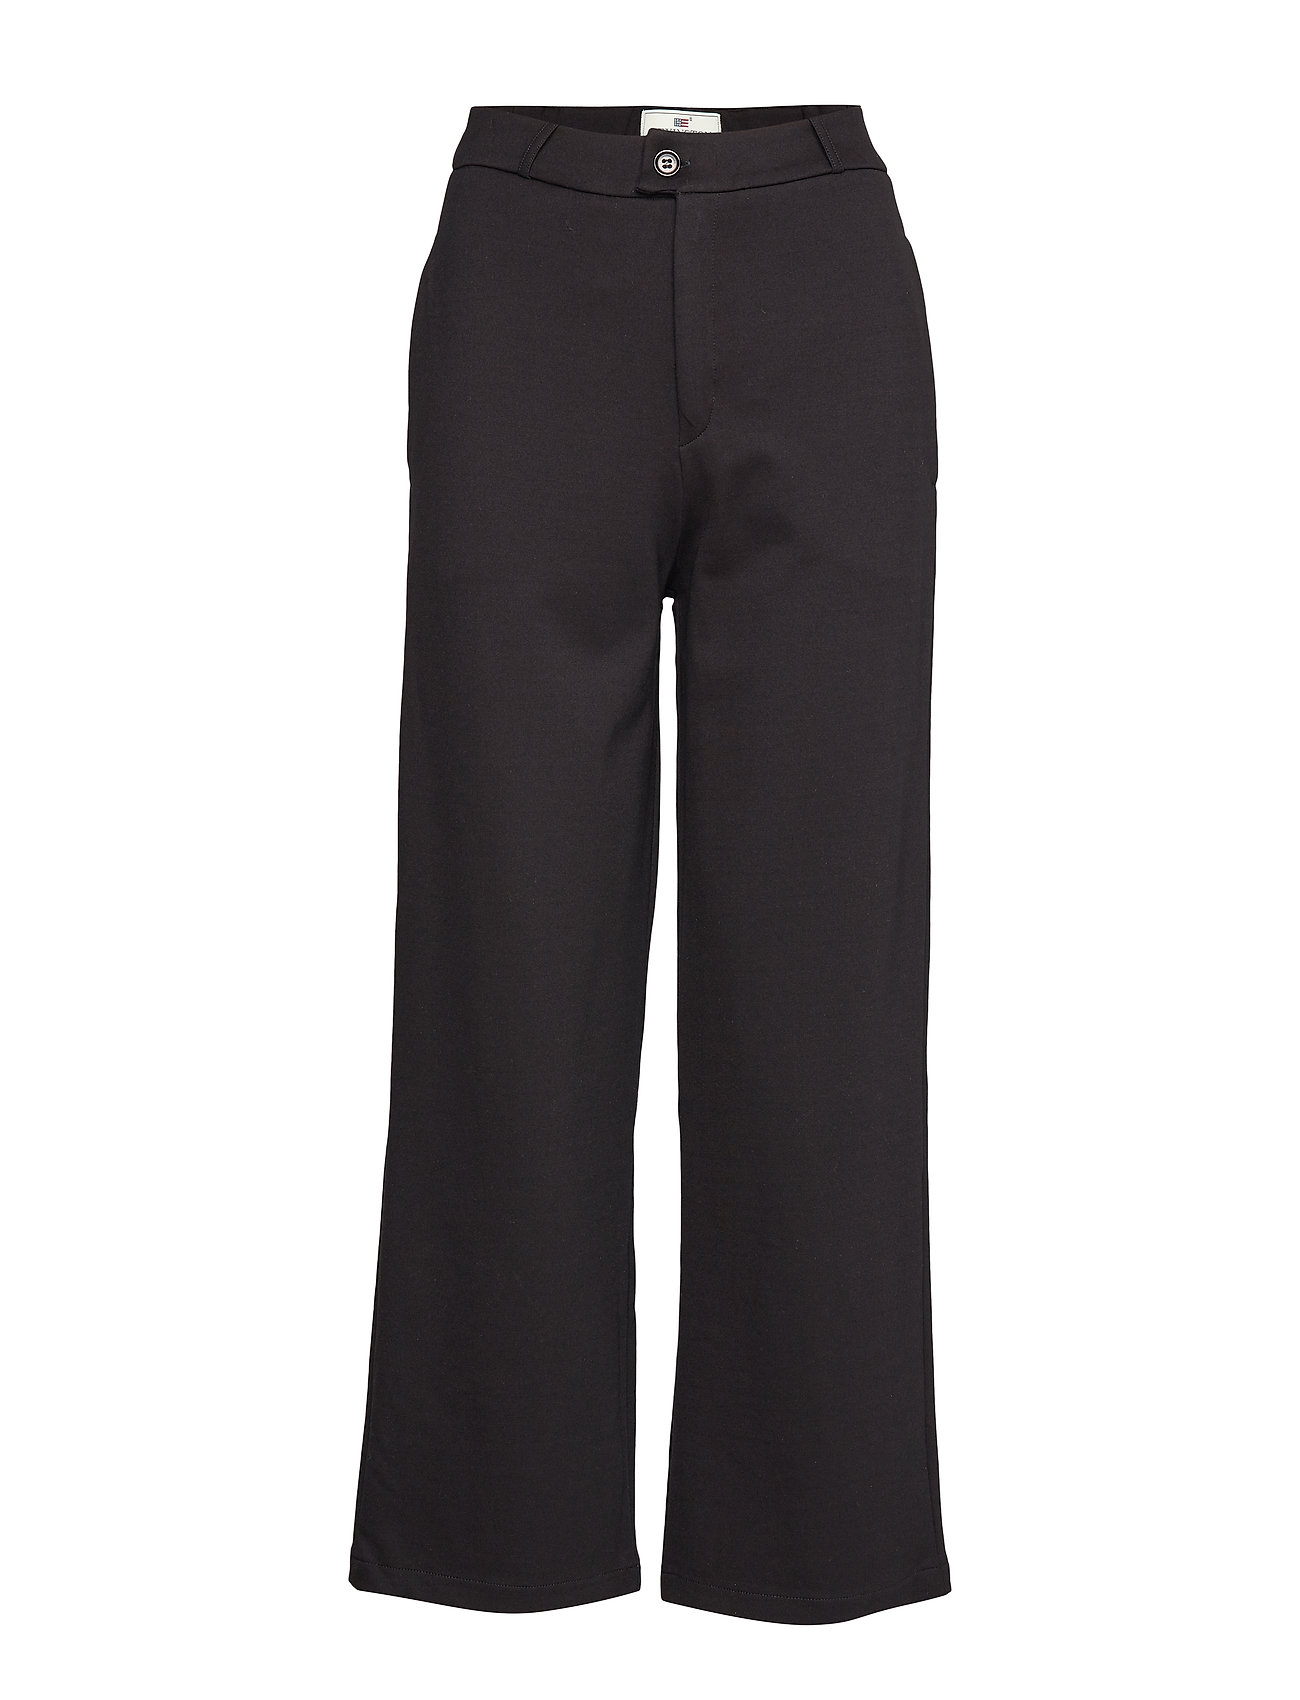 Lexington Clothing Cleo Tailored Jersey Pants - BLACK